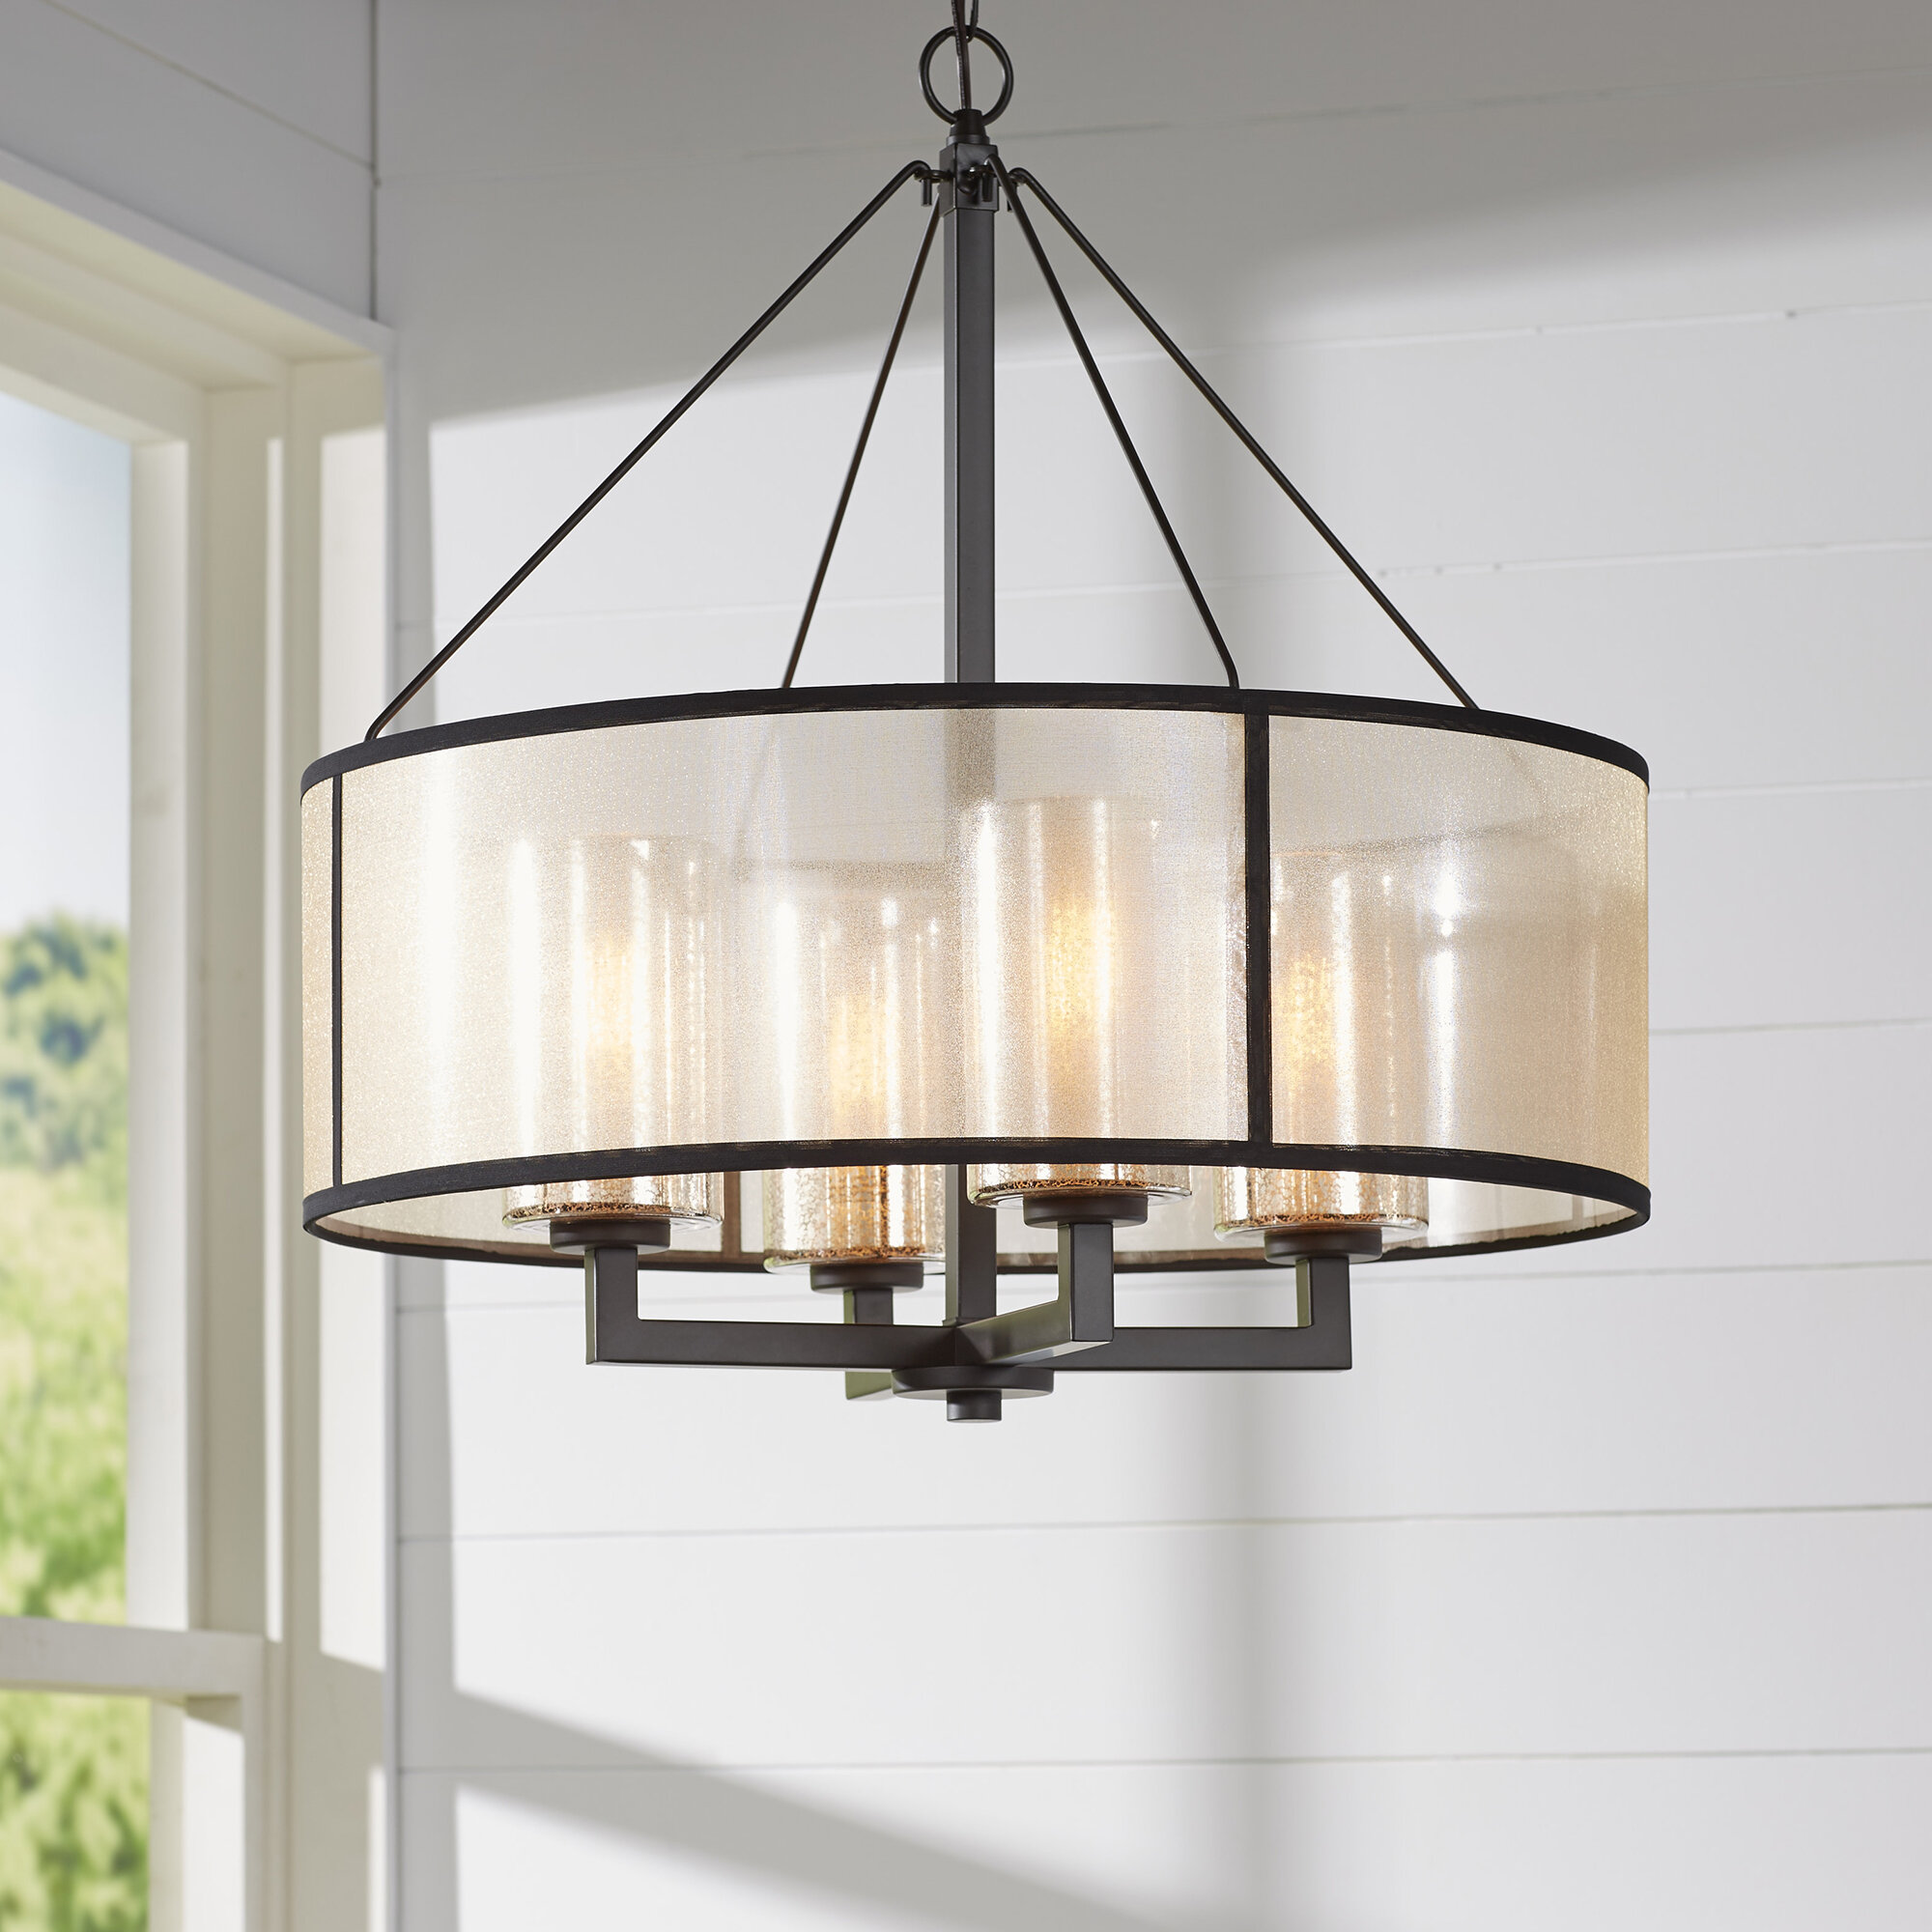 Brayden studio dailey 4 light chandelier reviews wayfair aloadofball Gallery